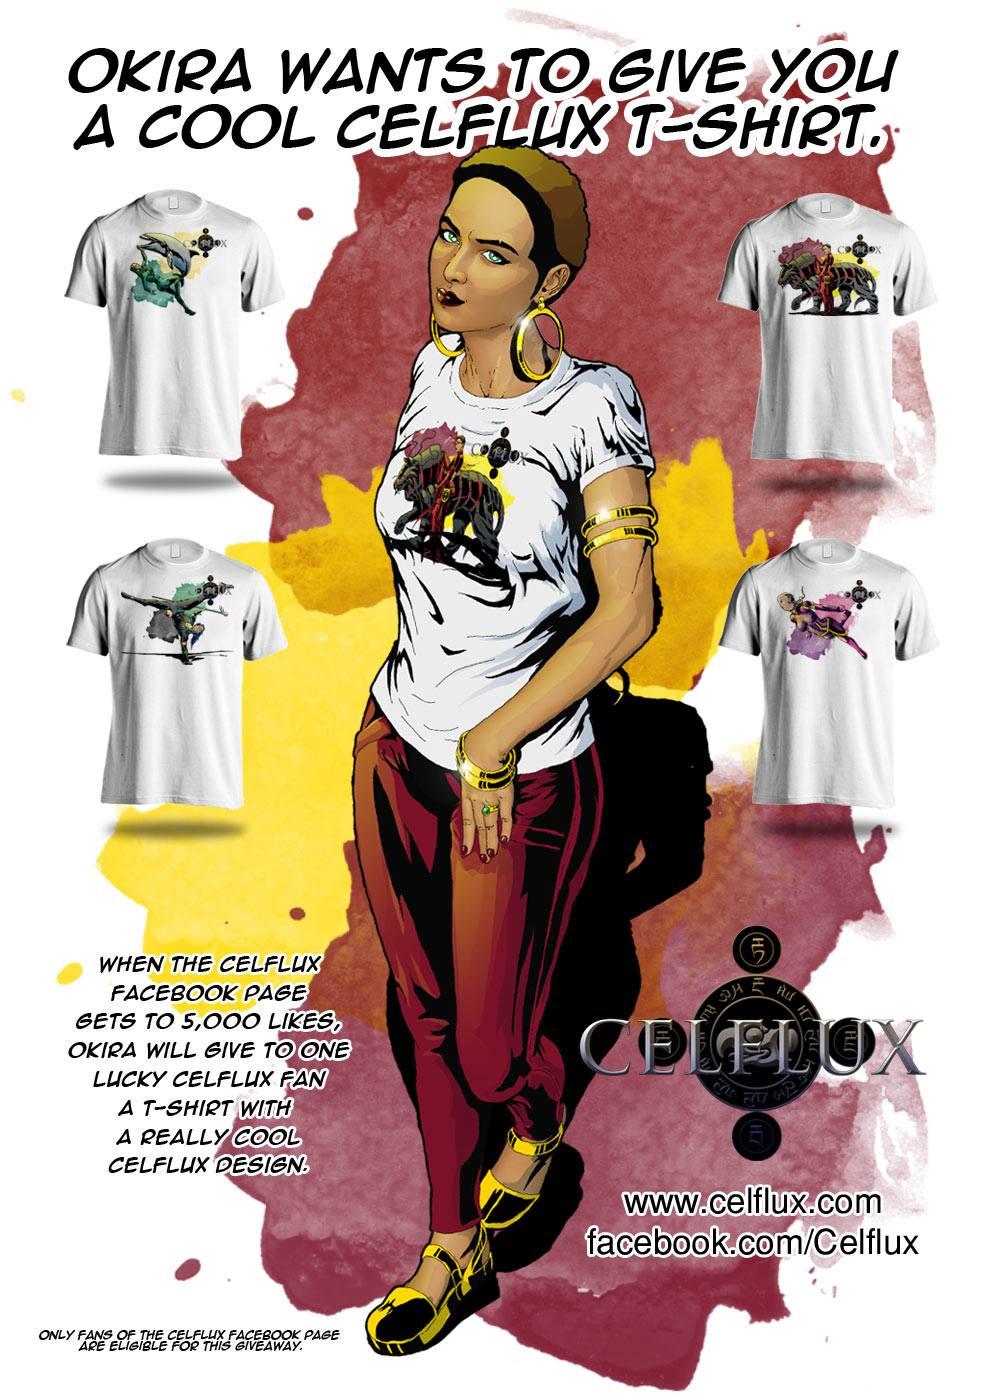 Okira's Celflux T-Shirt Giveaway